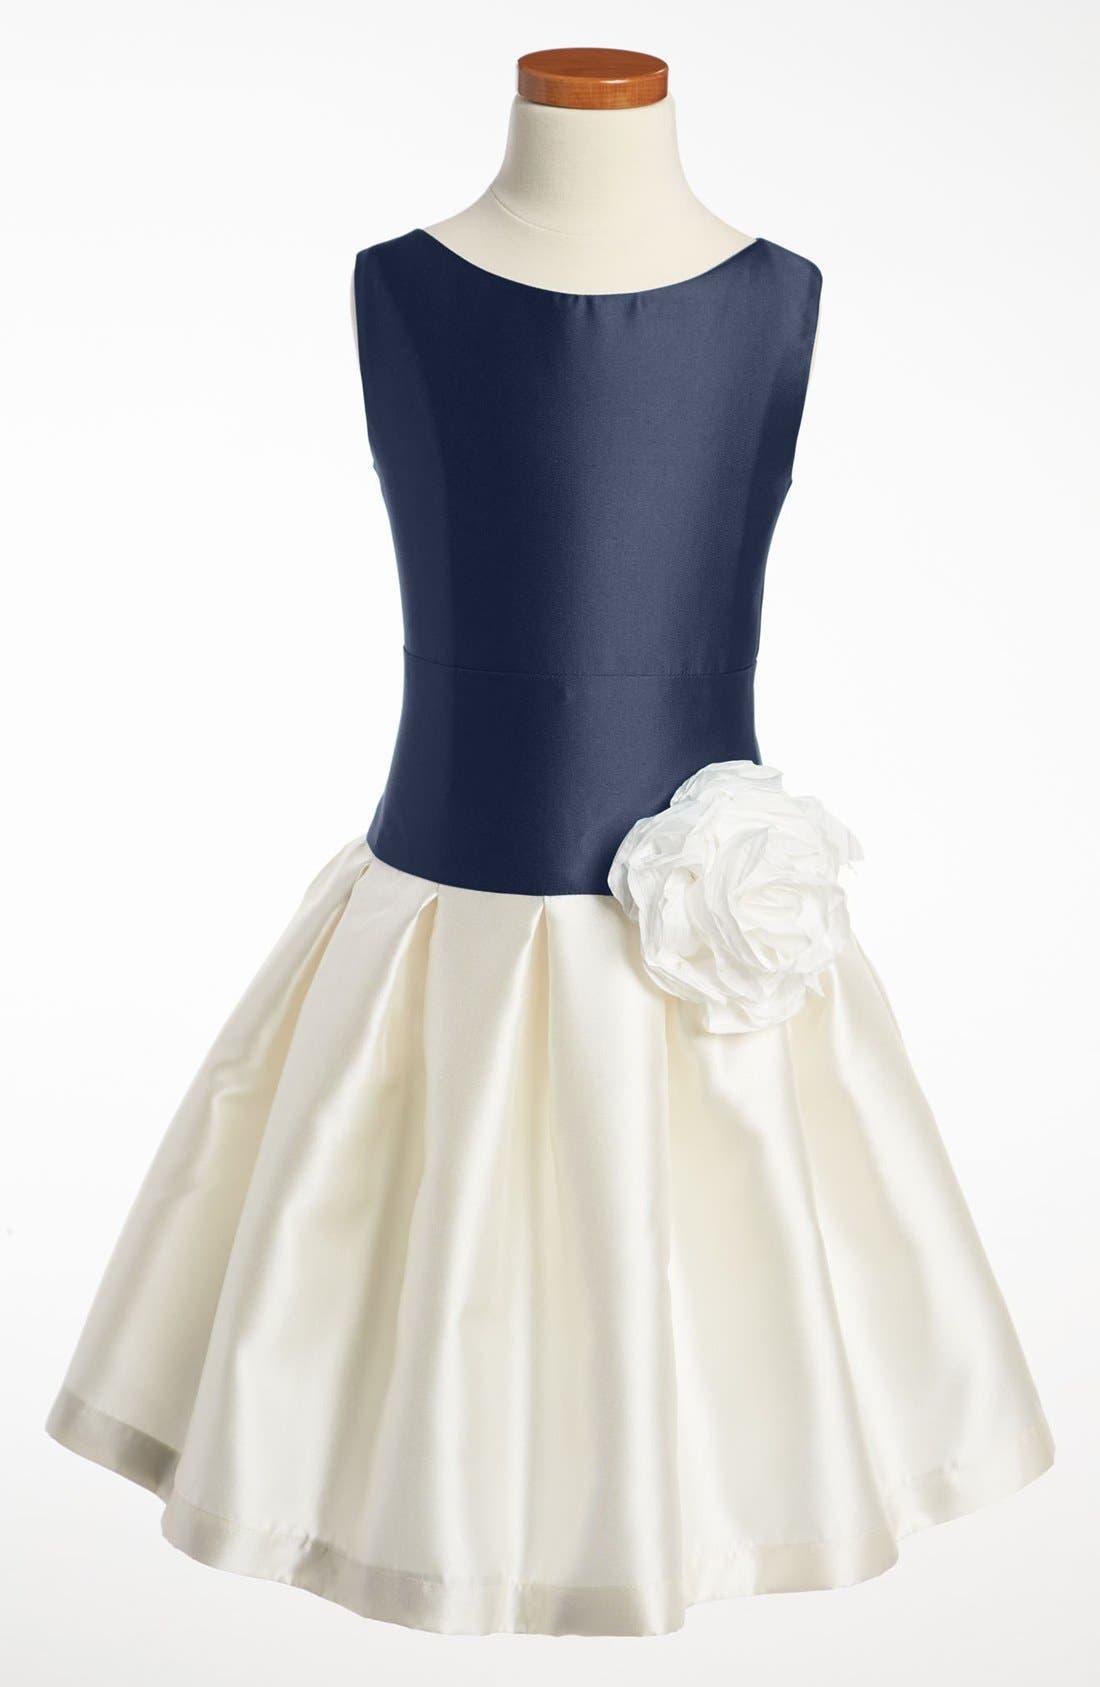 Alternate Image 1 Selected - Zoe Sleeveless Dress (Big Girls)